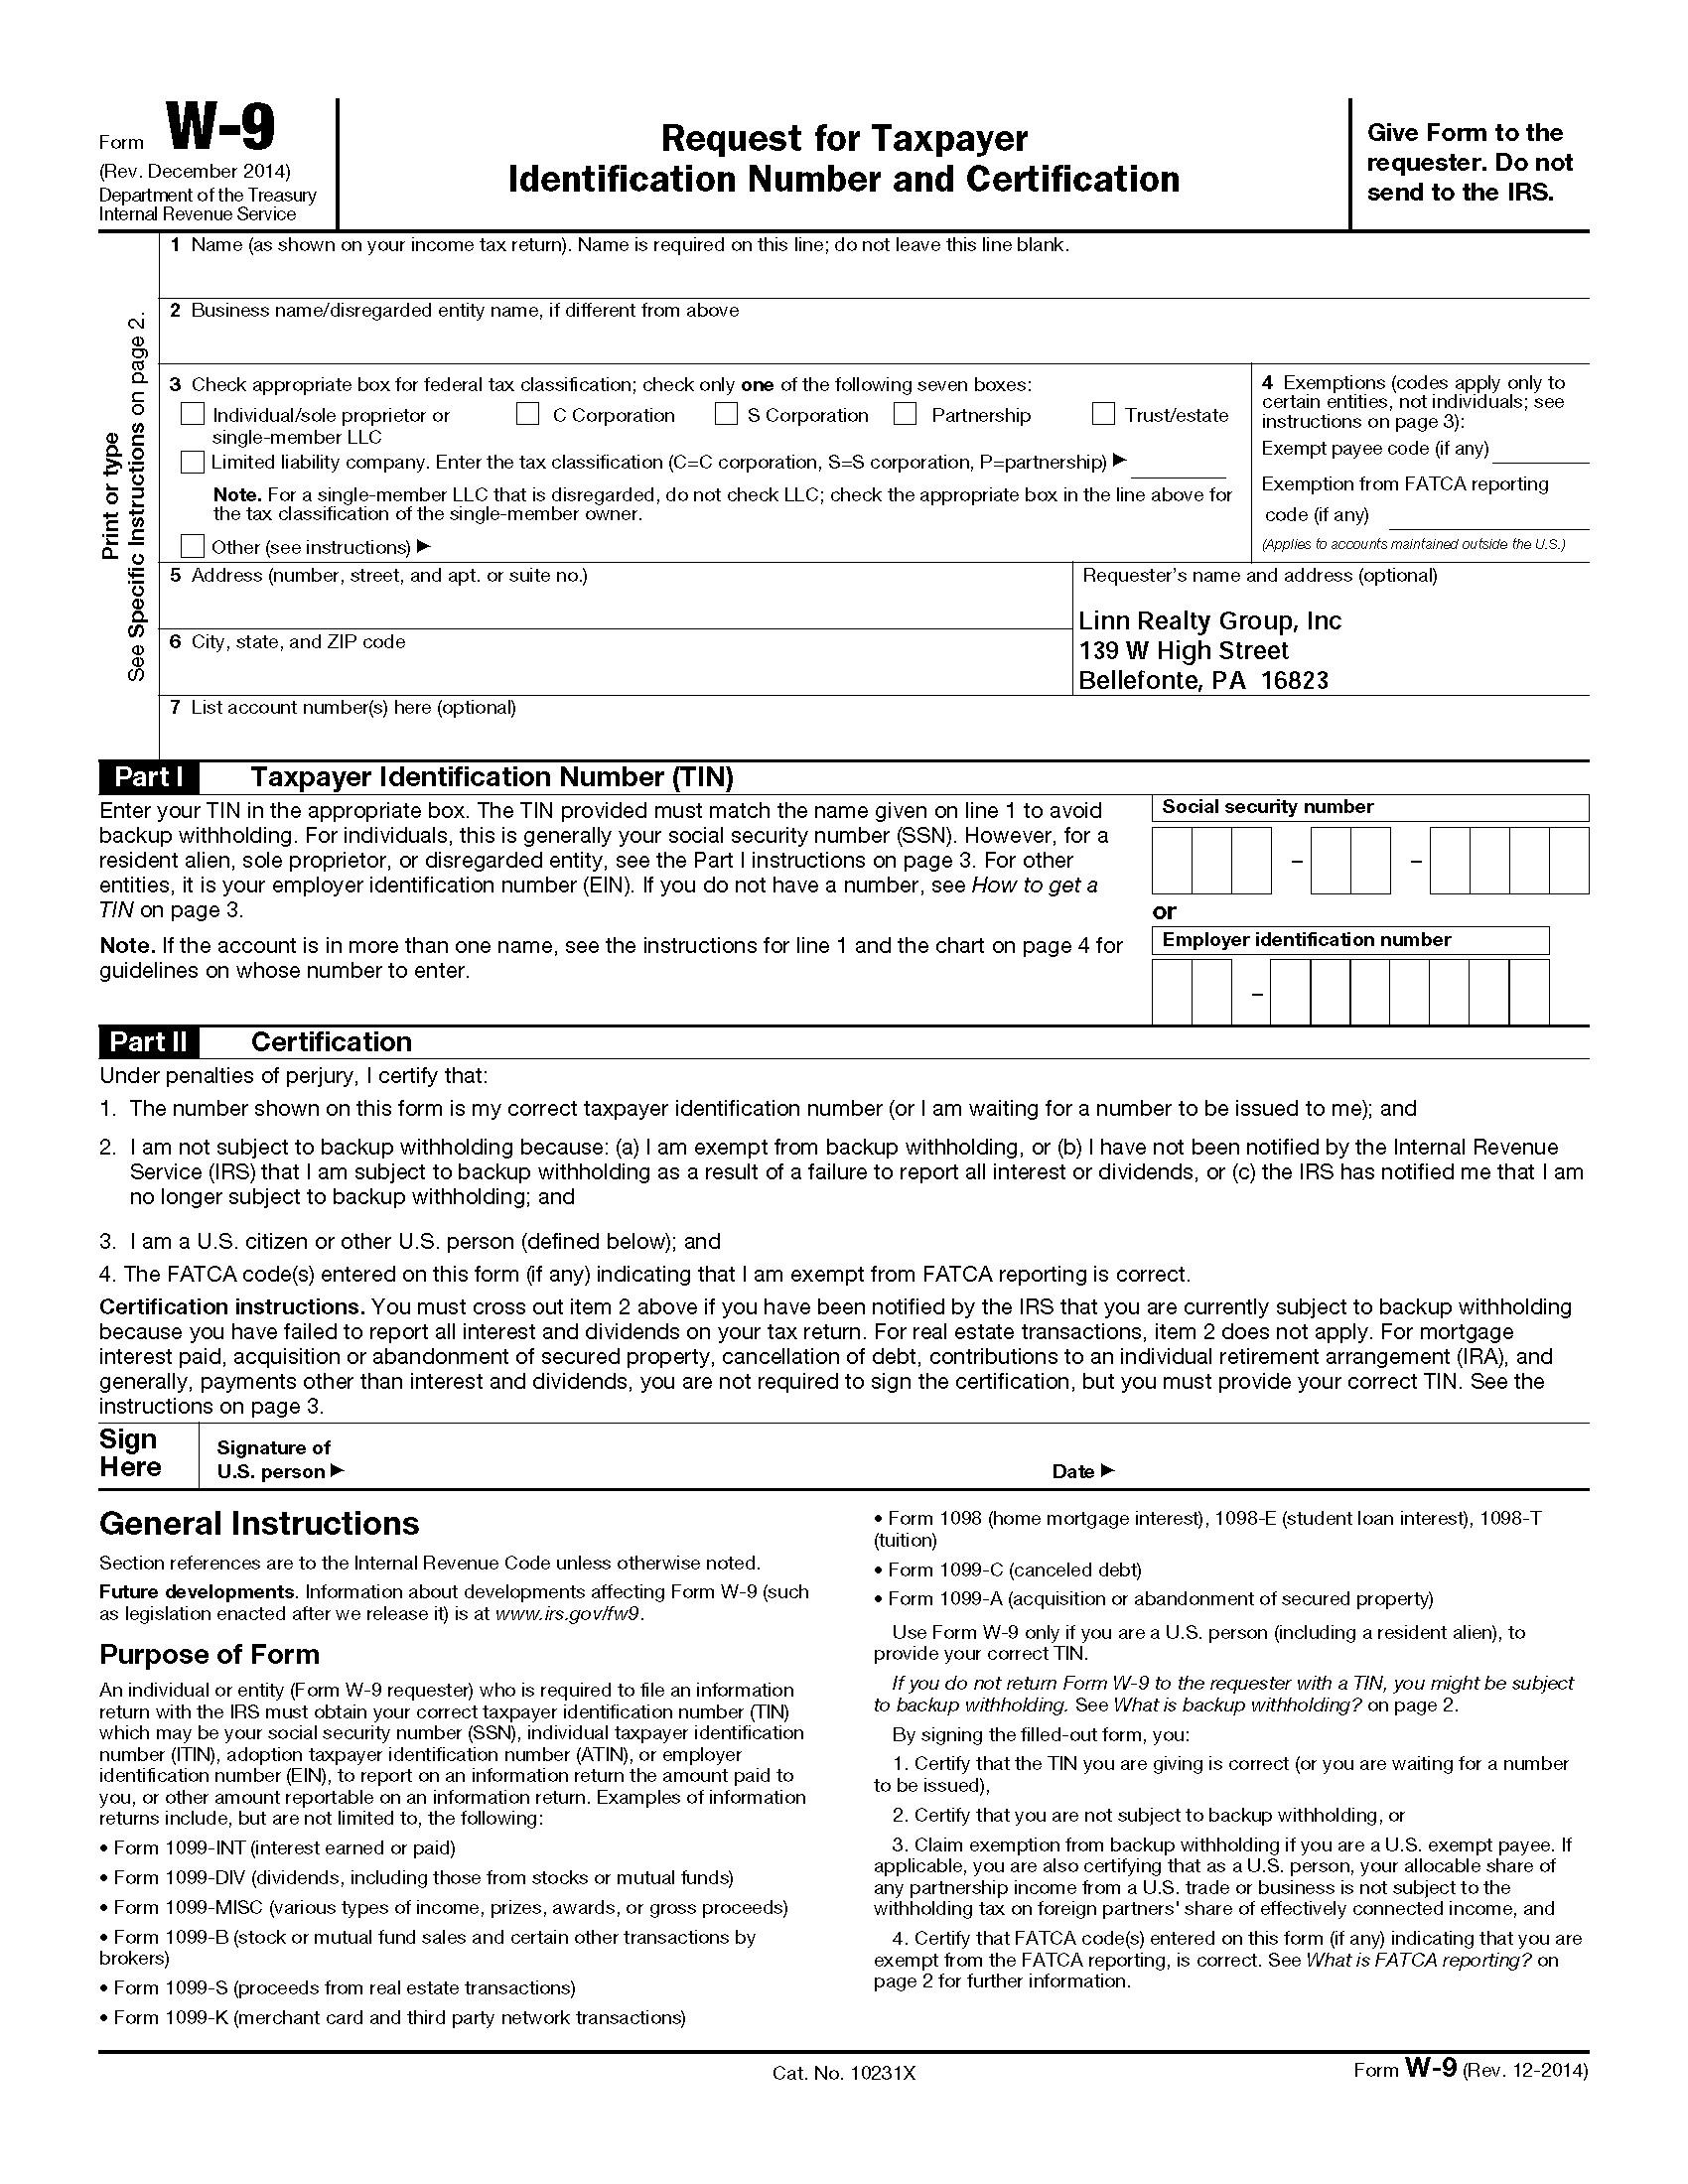 Blank 2019 W 9 Form Printable | Calendar Template Printable-W-9 Blank Form 2020